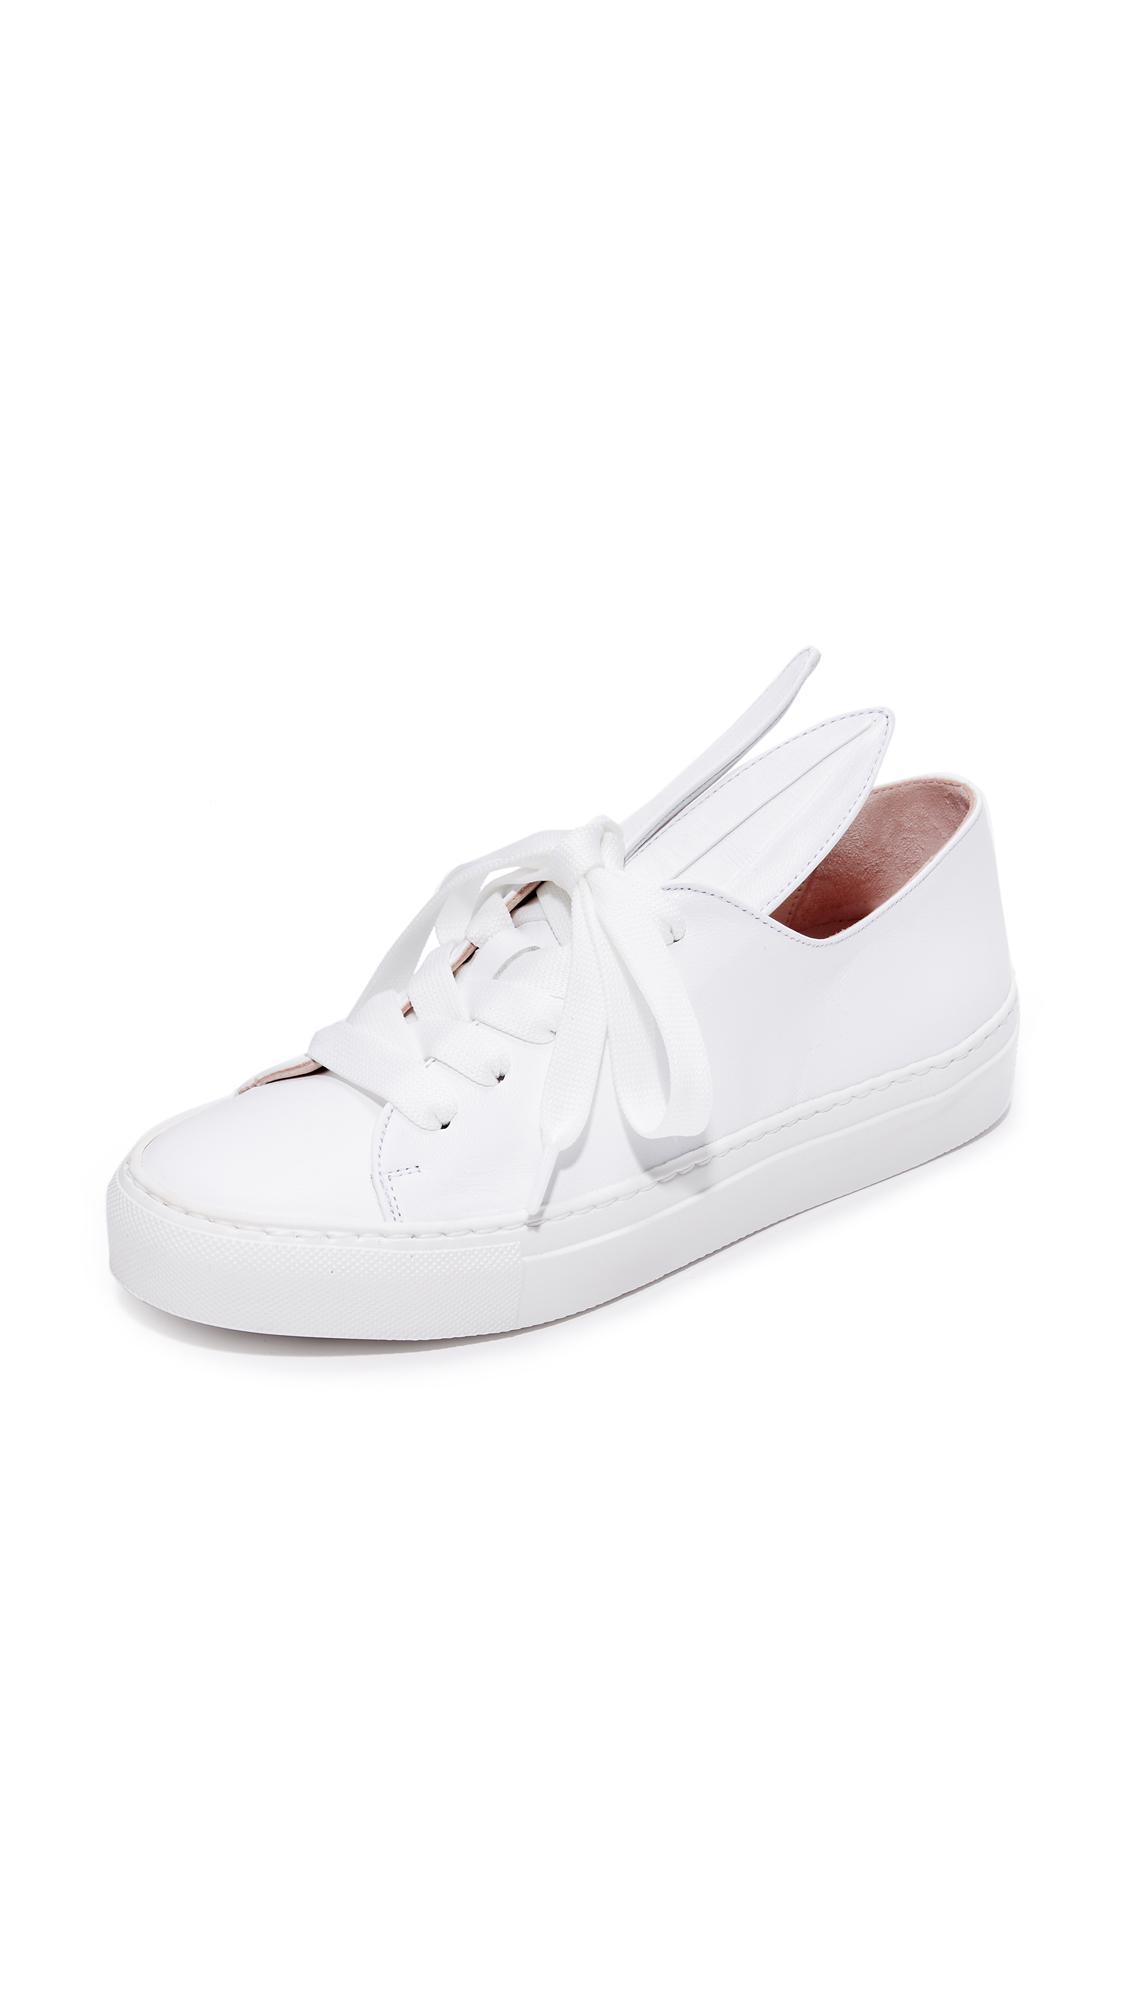 ALL EARS LOW TOP SNEAKERS WITH BUNNY EARS - FOOTWEAR - Low-tops & sneakers Minna Parikka W8VTxf4